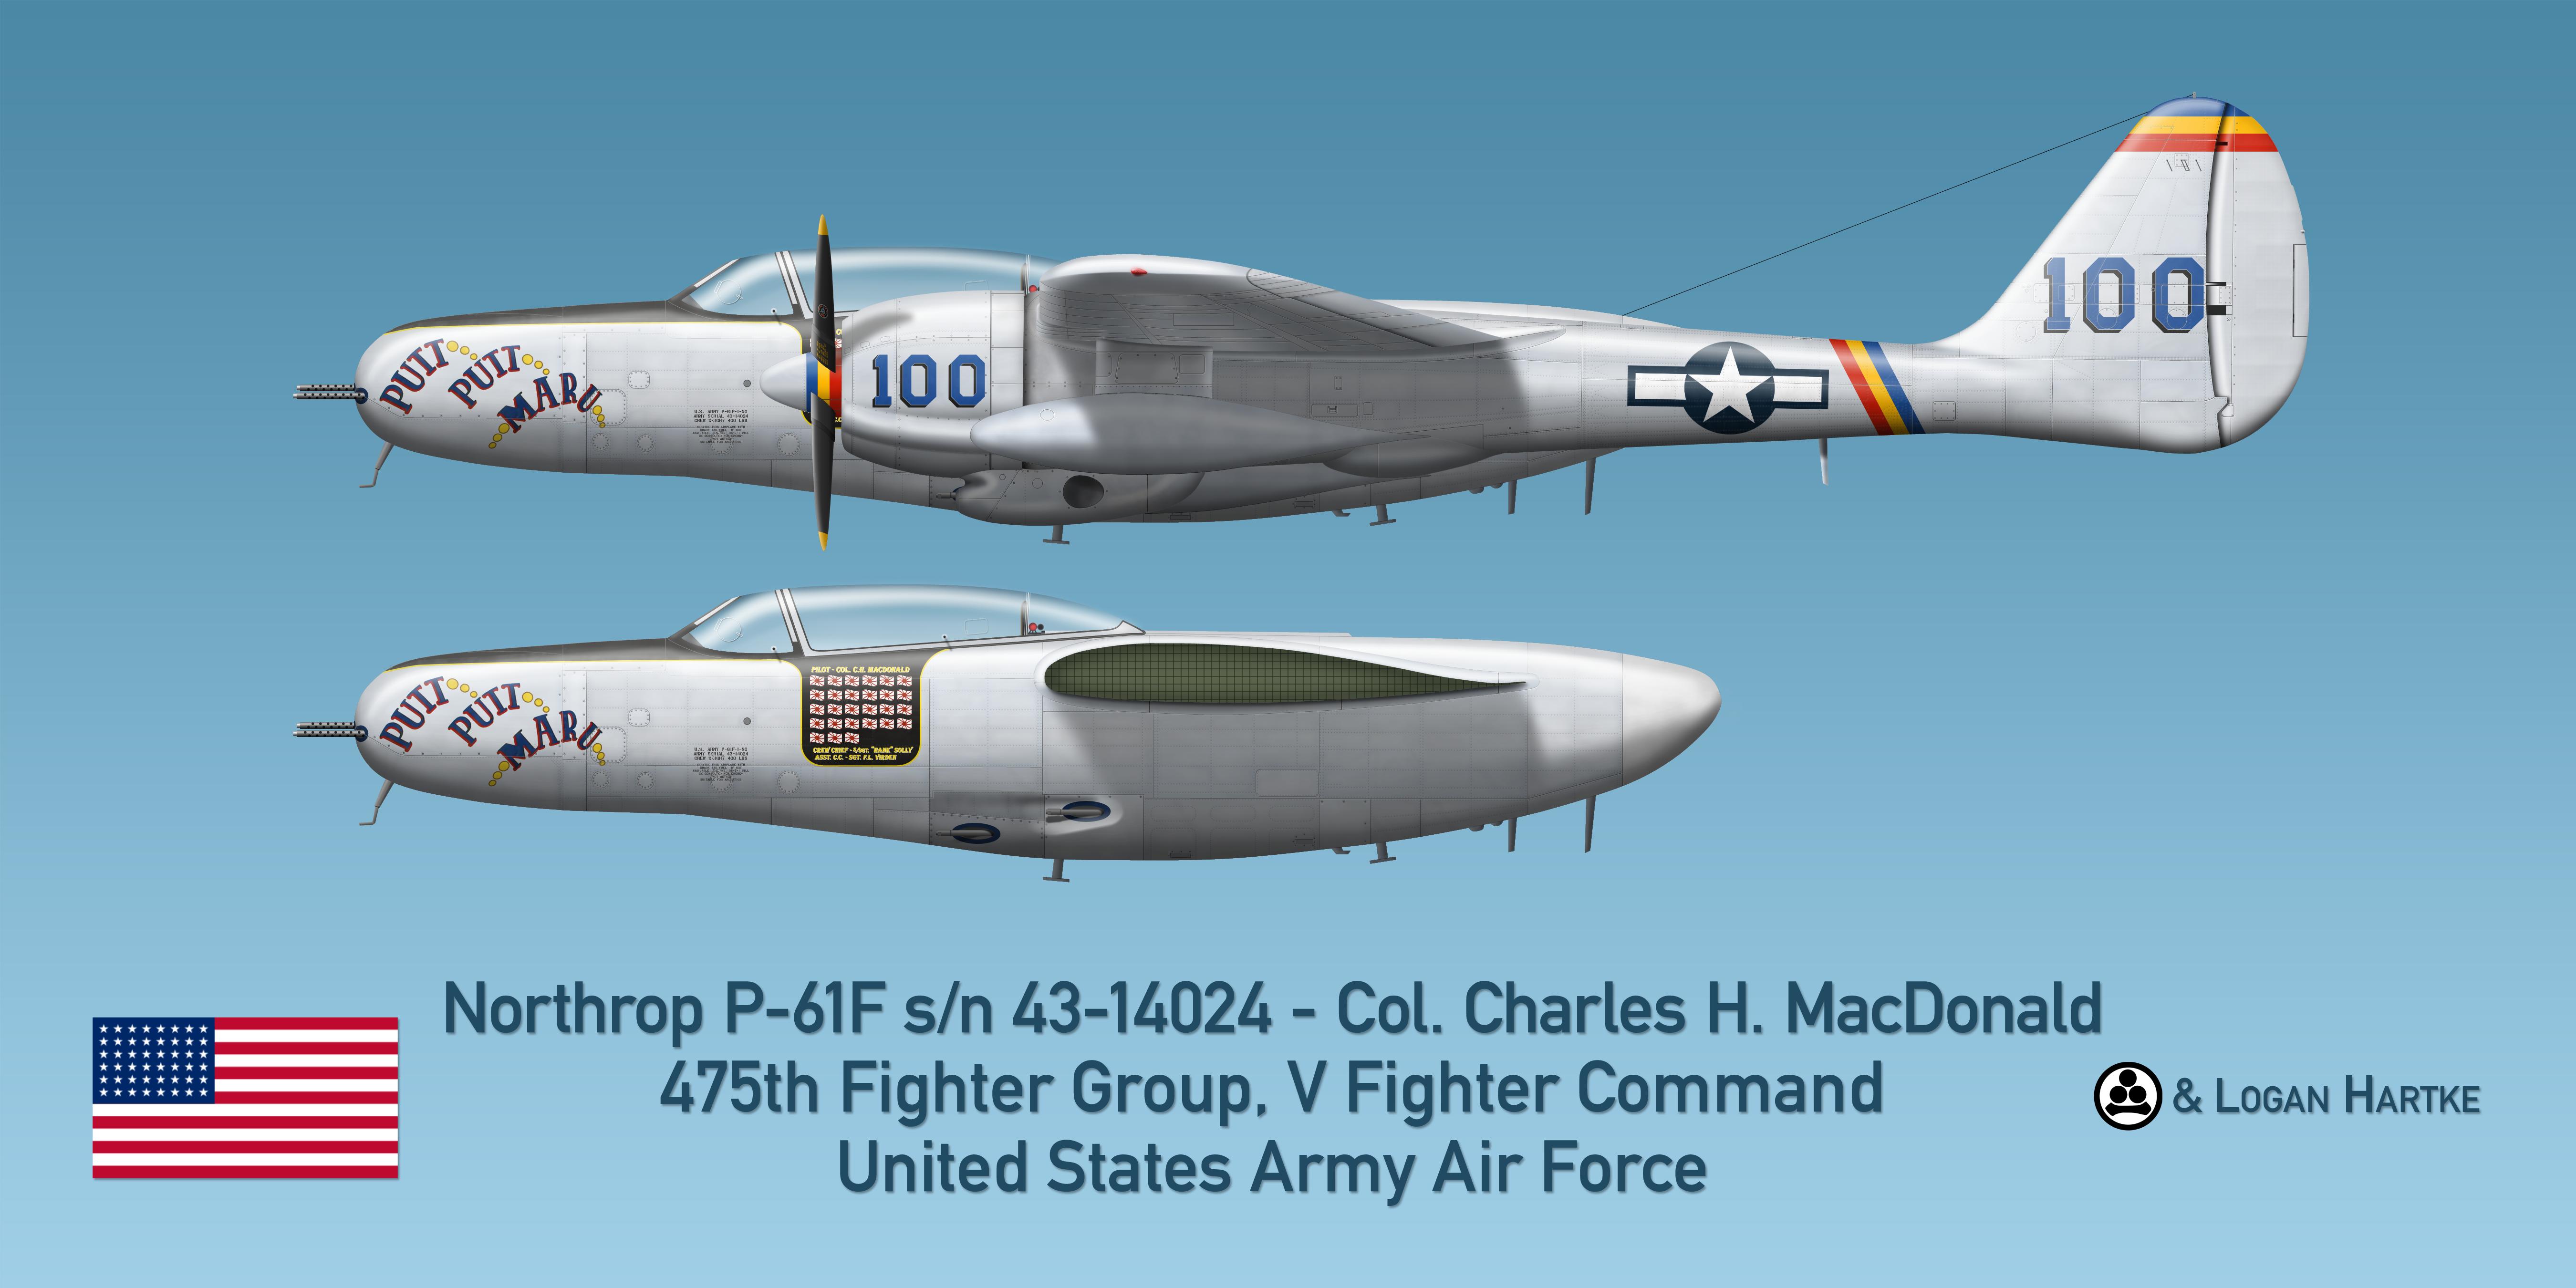 Northrop P-61F - Putt Putt Maru - Col. MacDonald